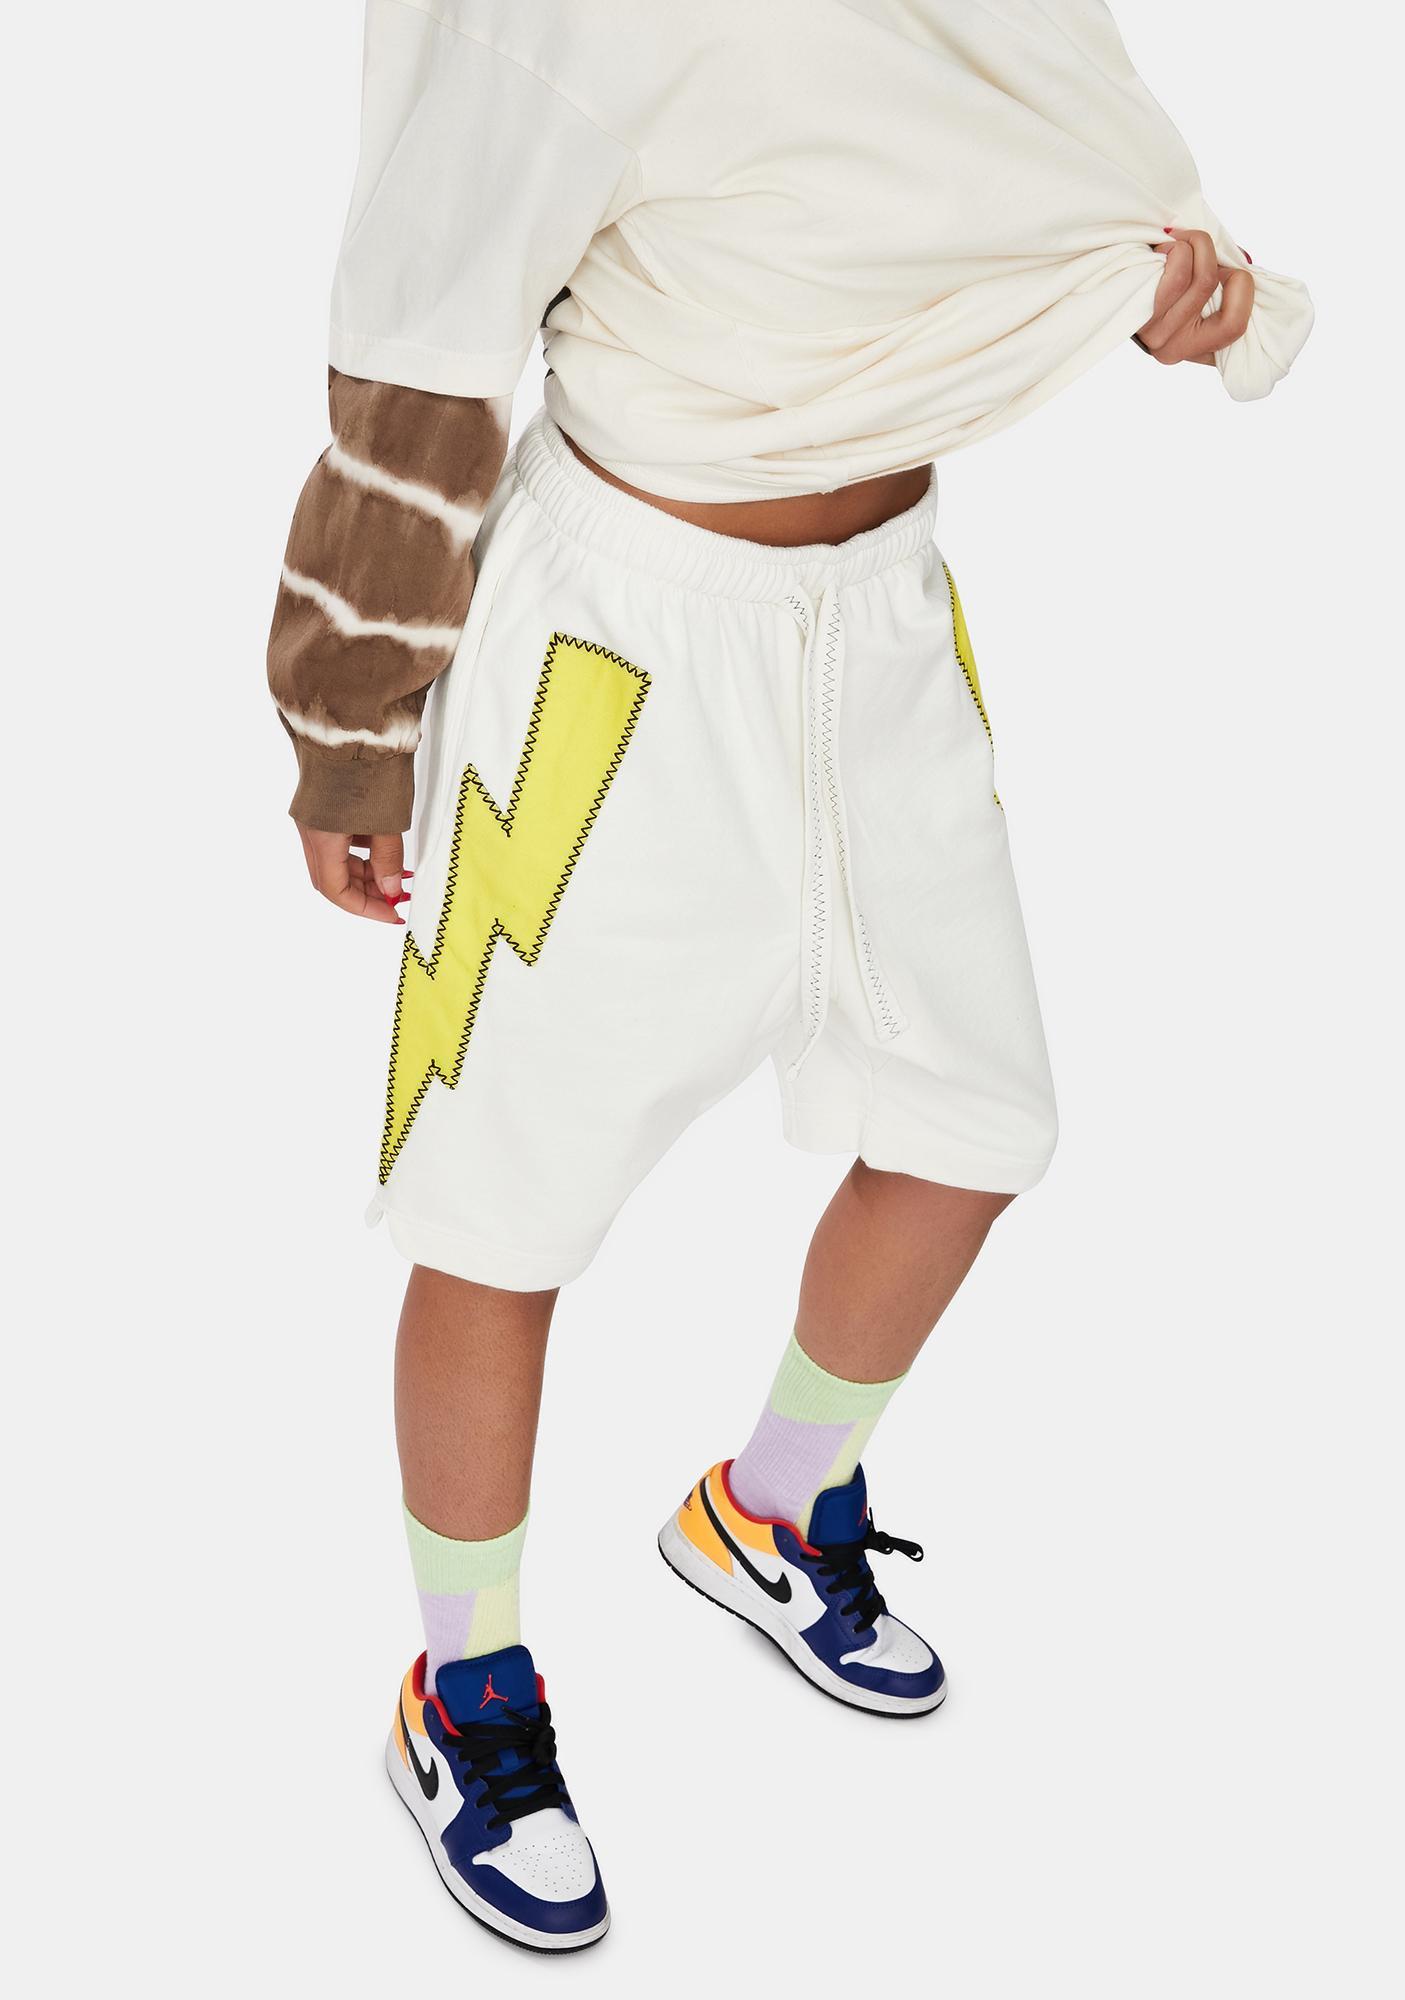 The Rad Black Kids Jump Higher Shorts